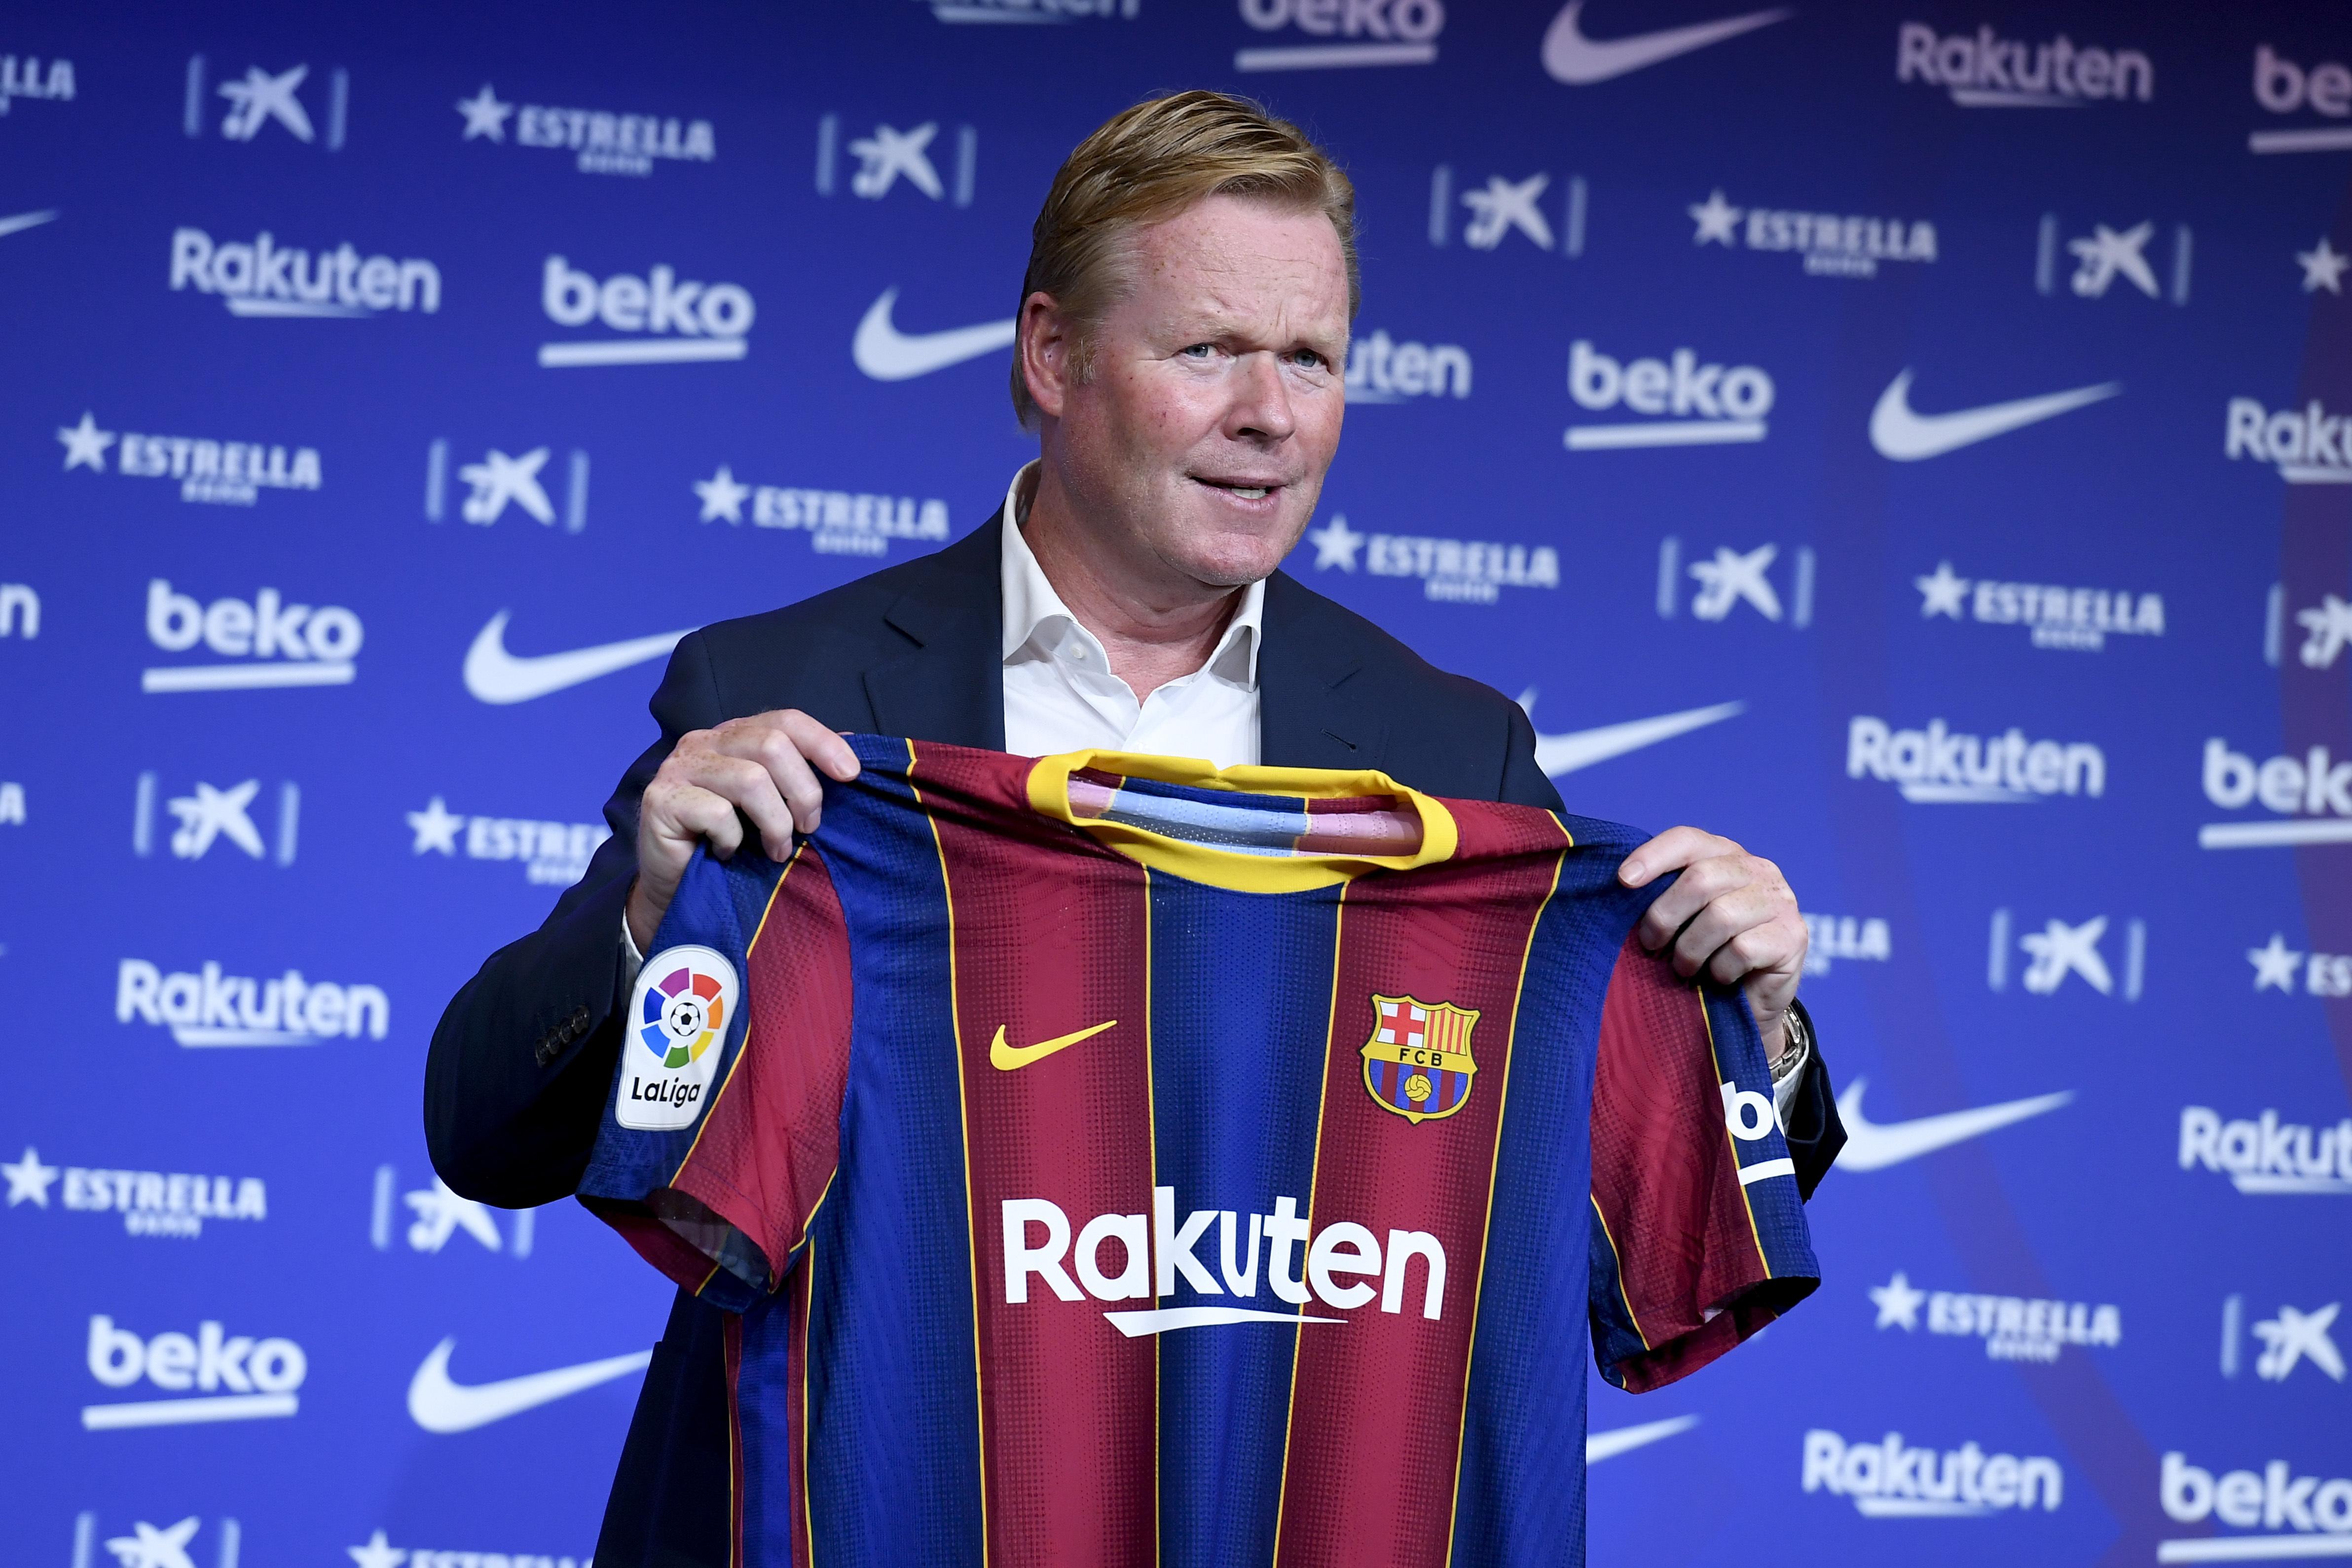 Barcelona FC presents Ronald Koeman as new head coach